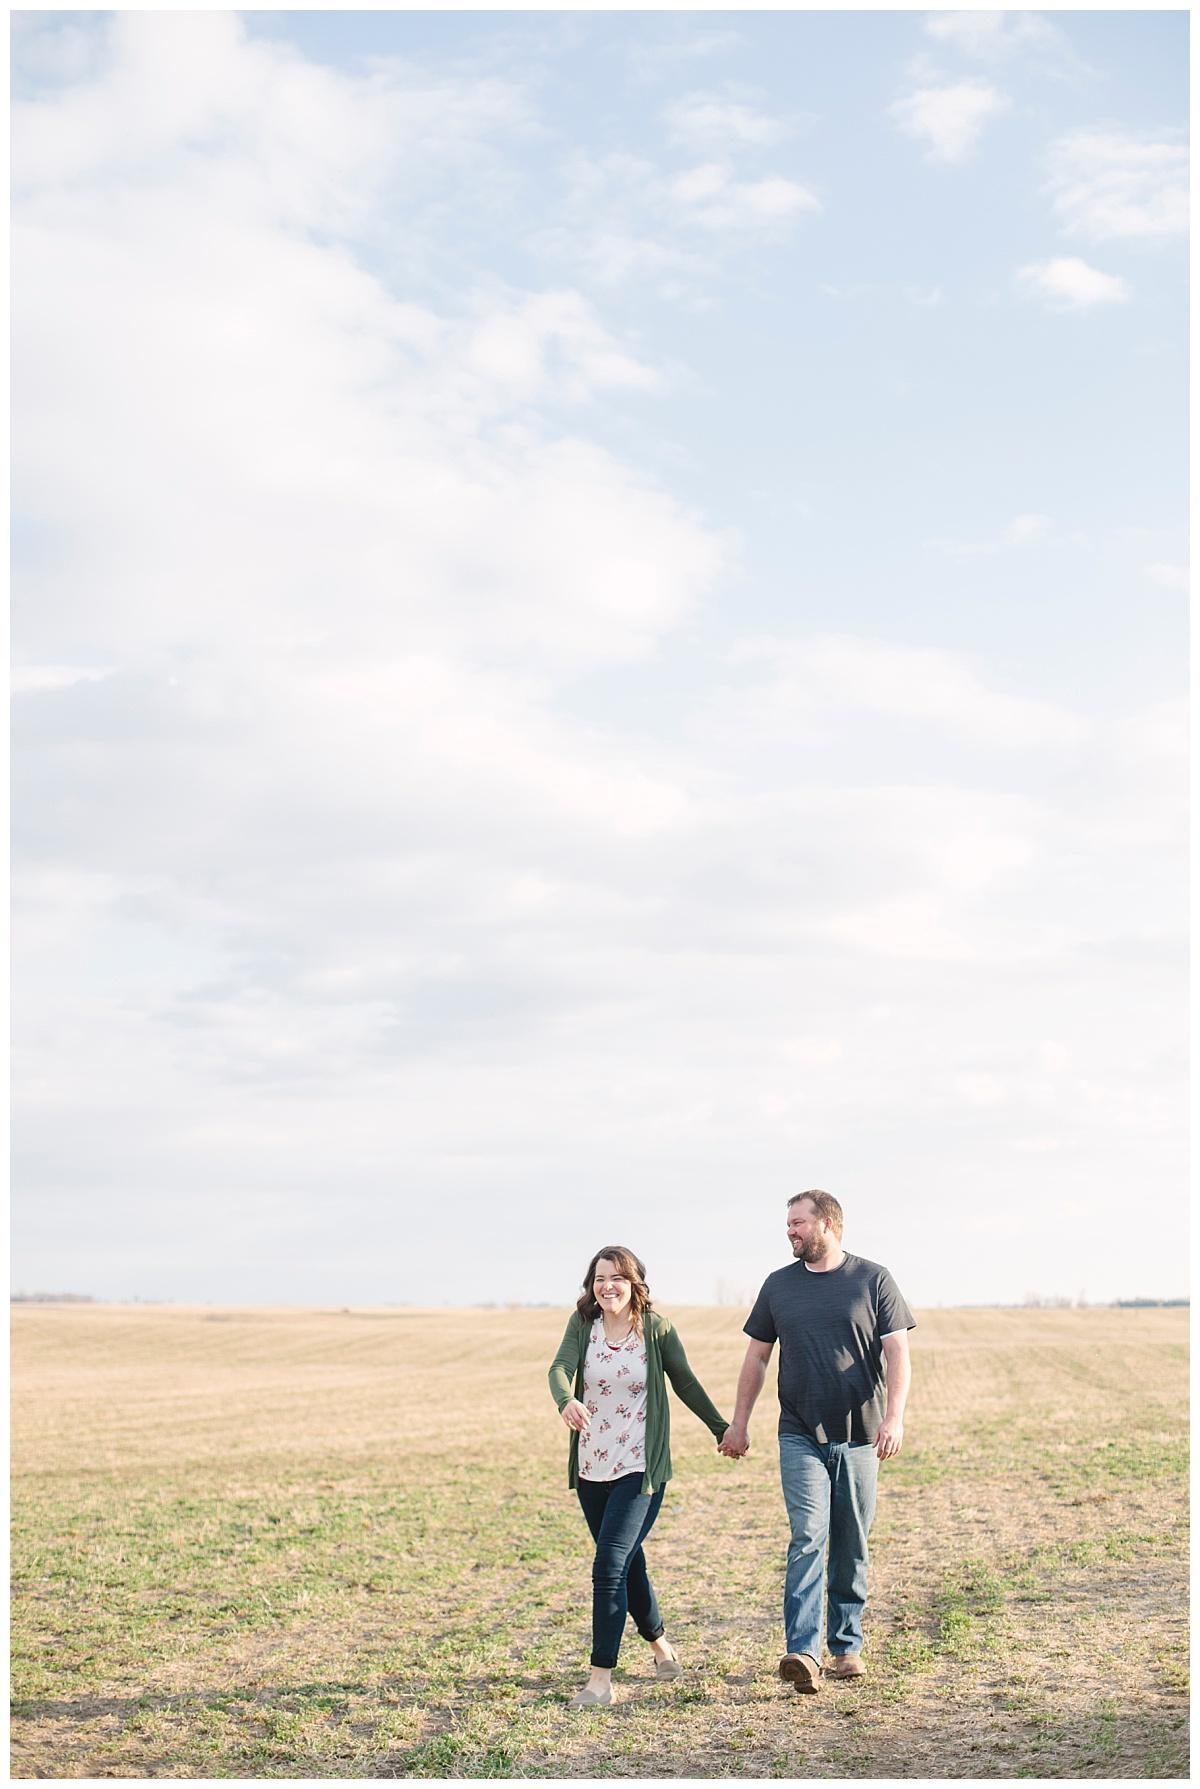 FarmEngagement_BethanyMelvinPhotography_SouthDakota_0008.jpg